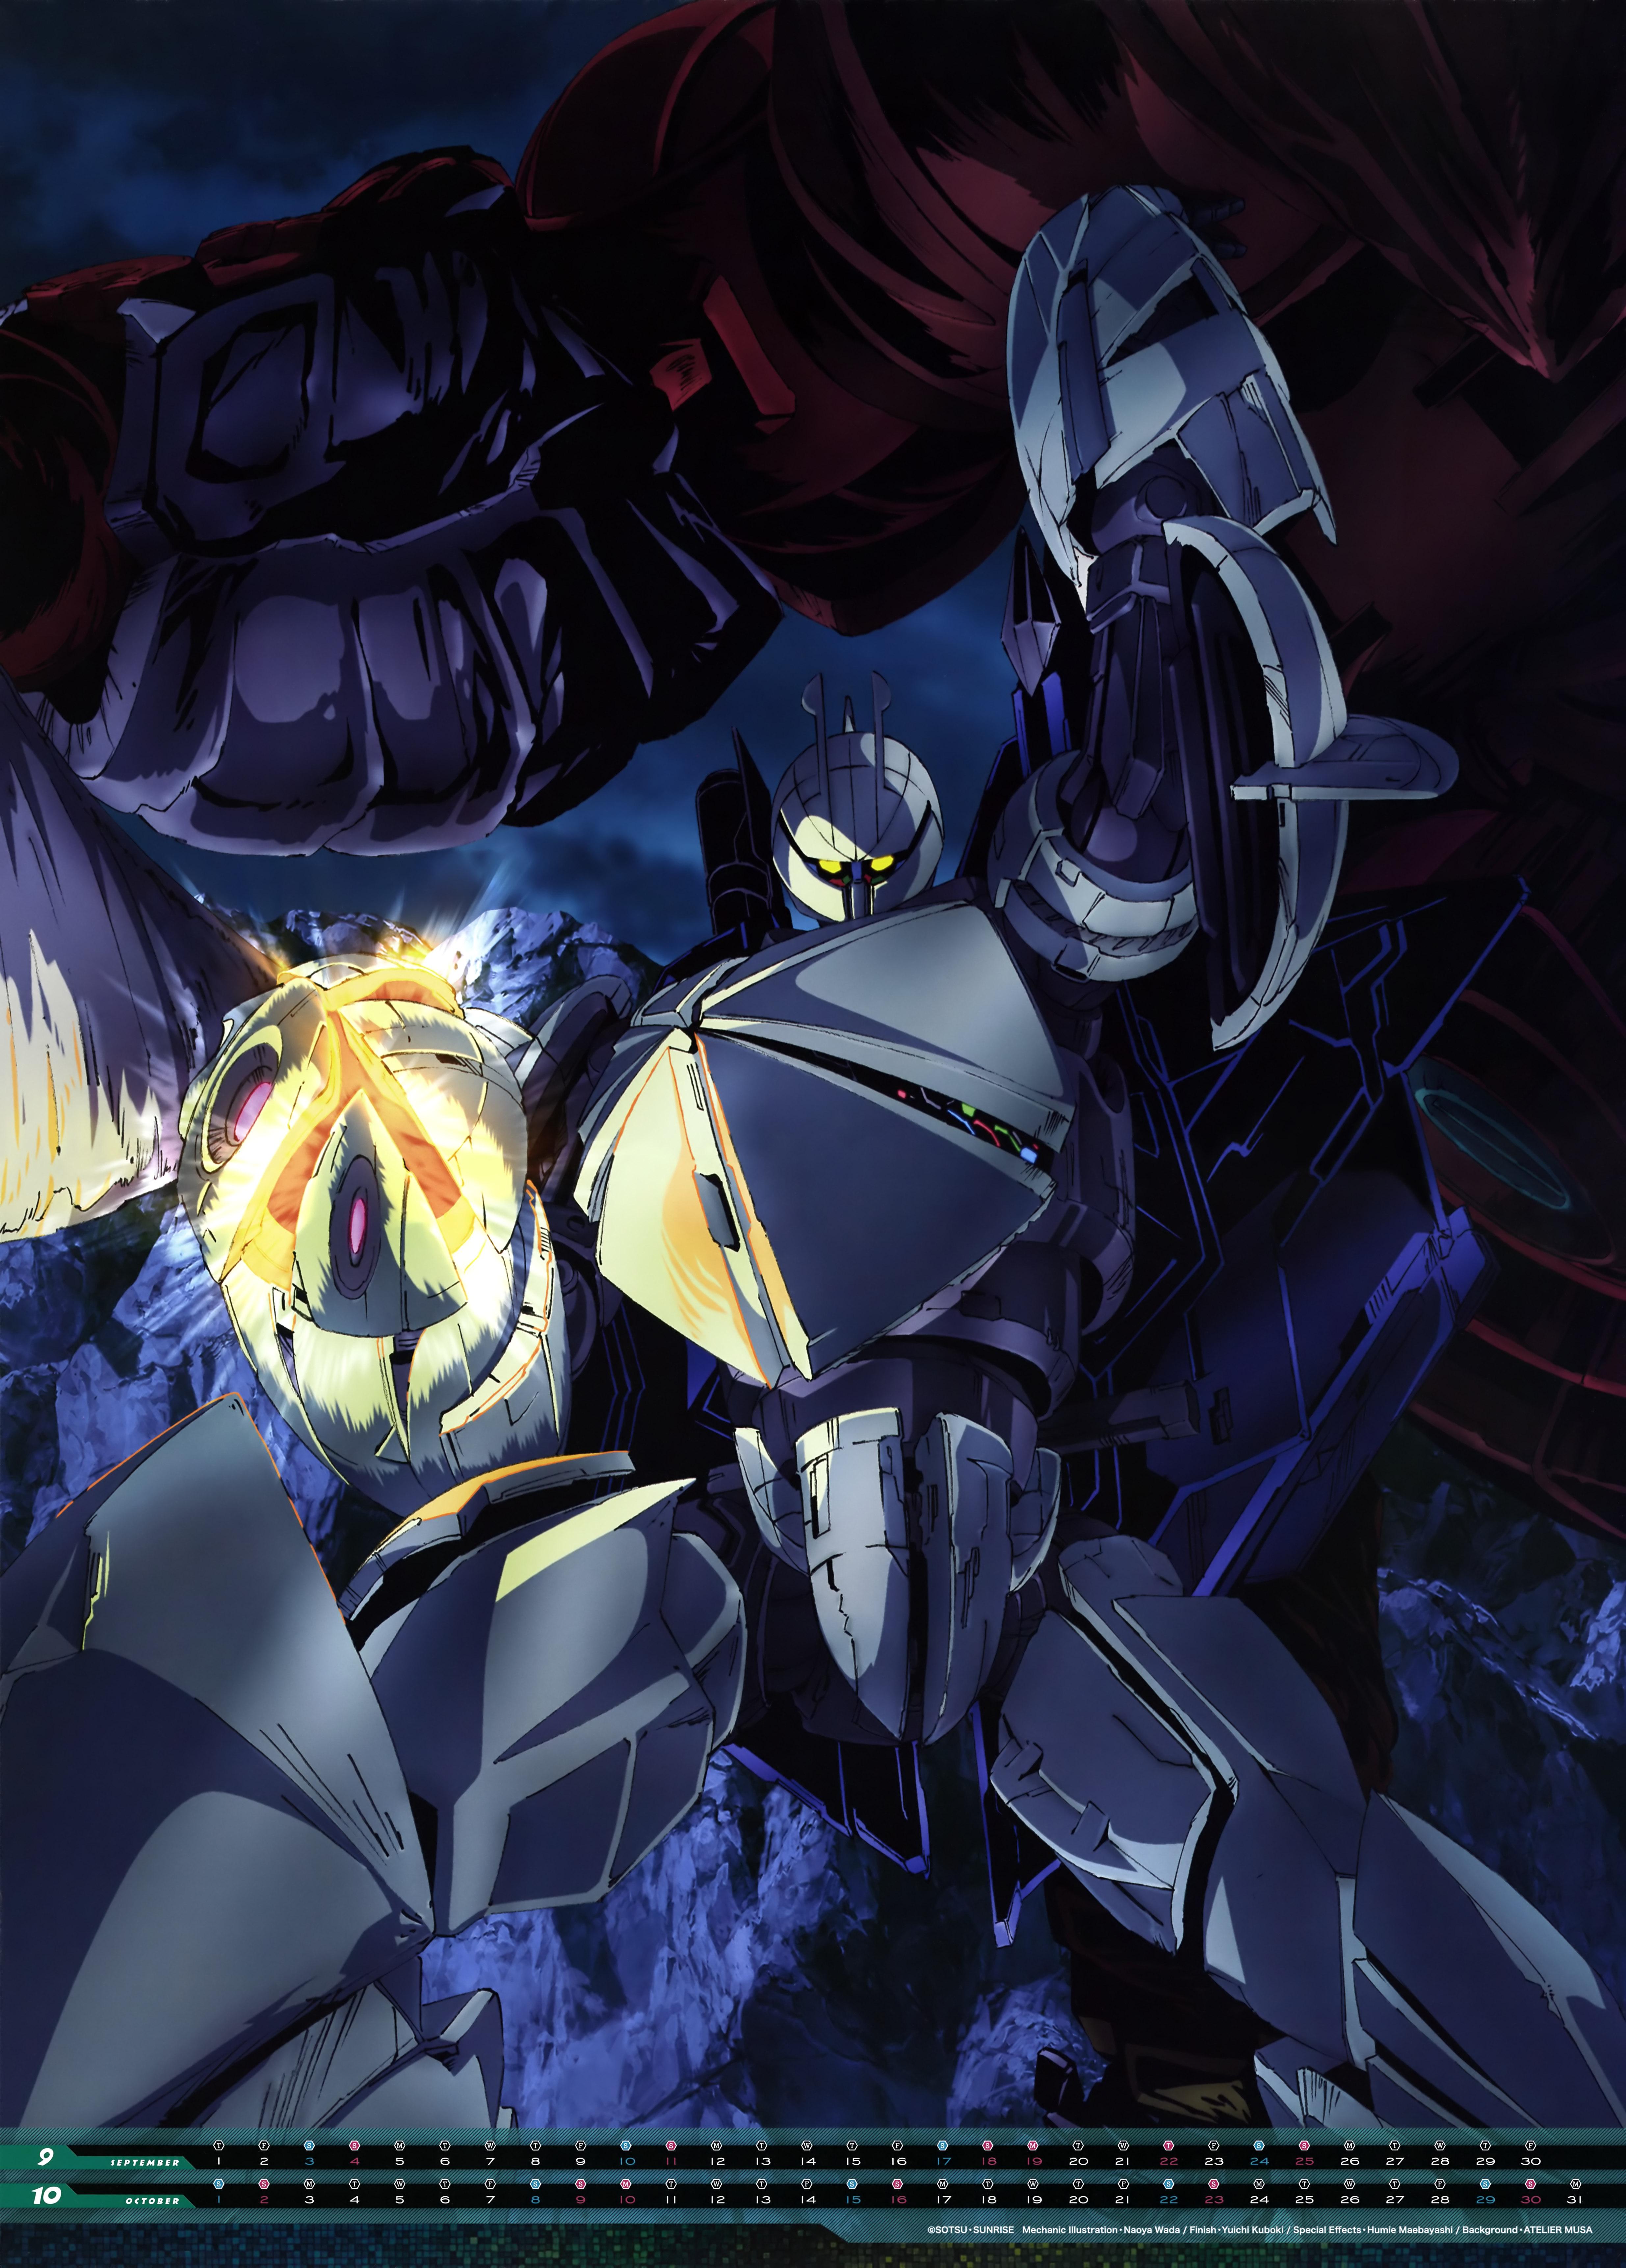 Mobile Suit Gundam Series anime Calendar 2016 0006